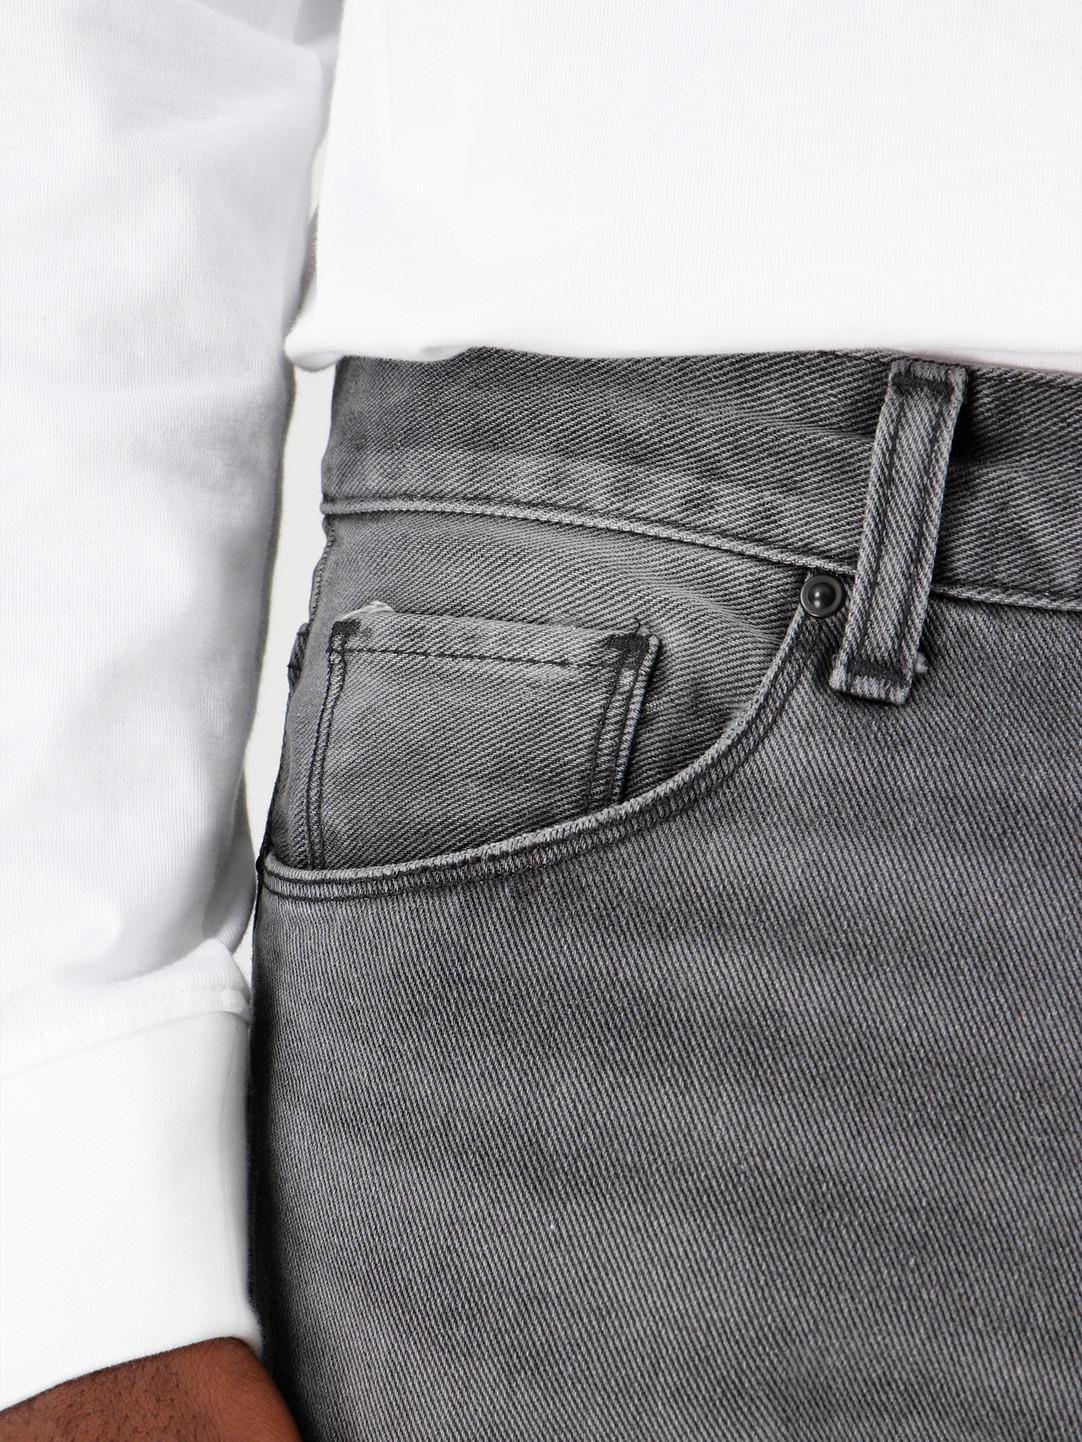 Carhartt WIP Carhartt WIP Vicious Pant Black Worn Bleached I027230-89WJ